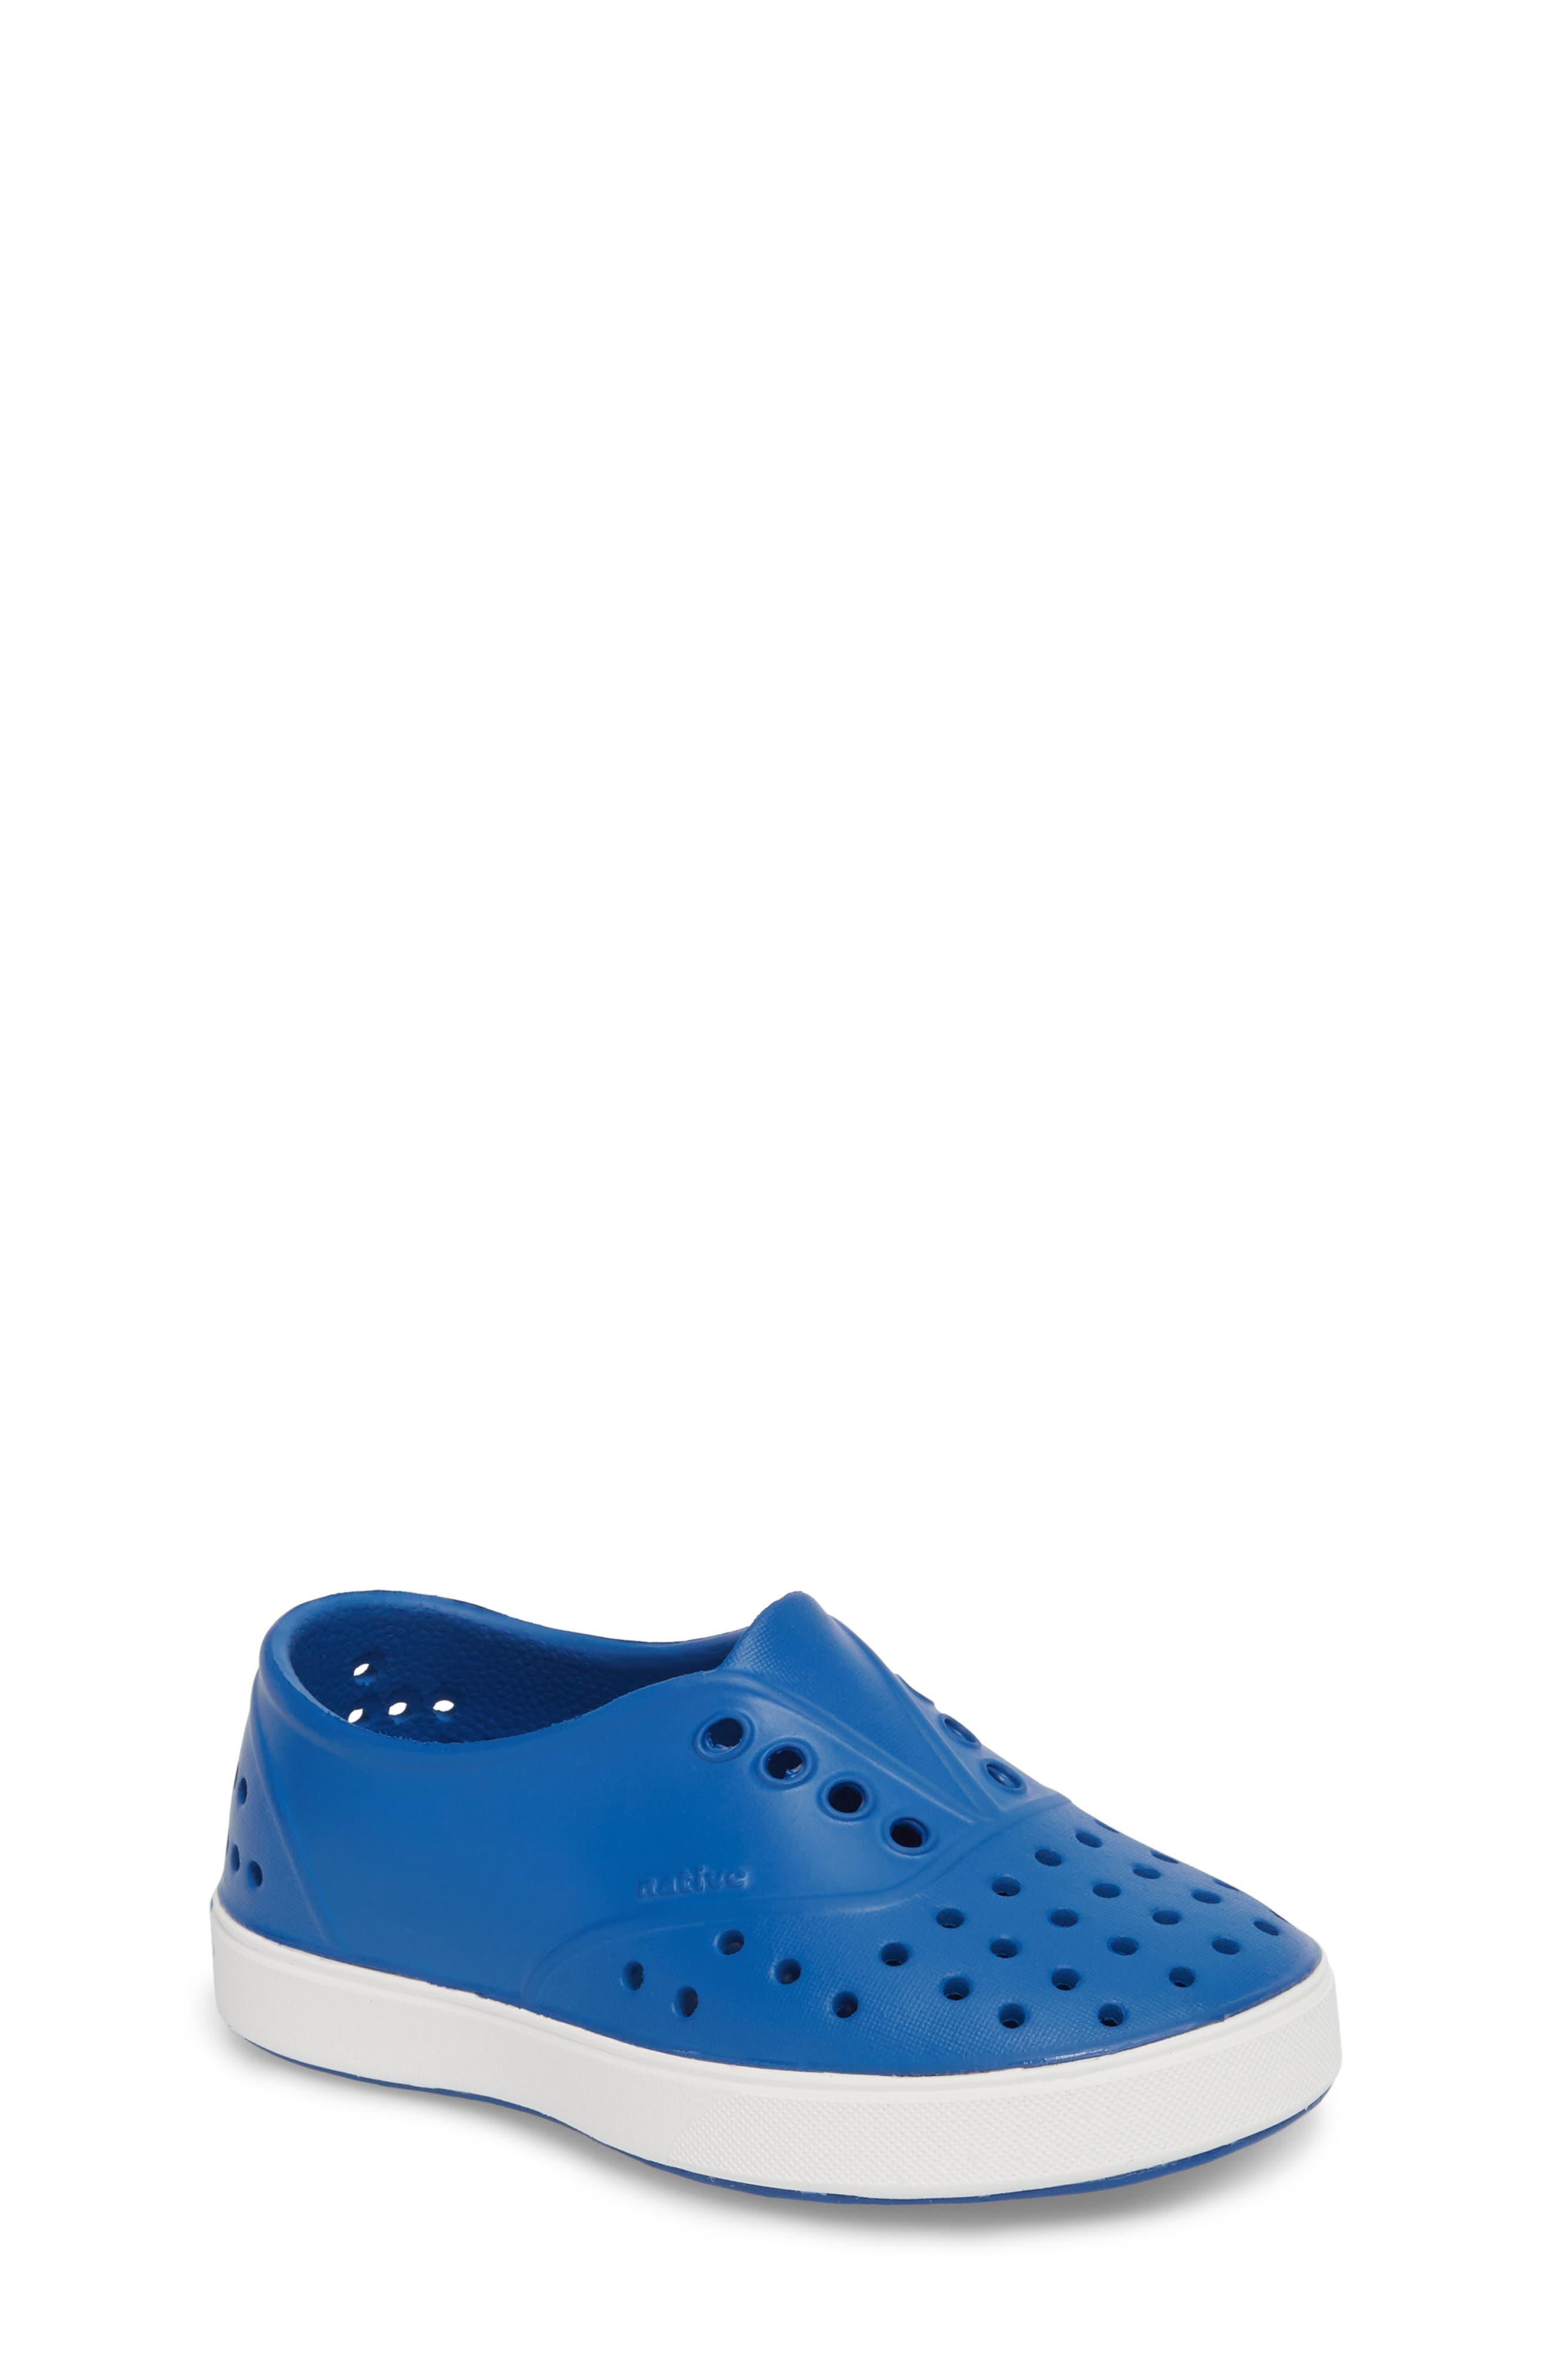 Native Shoes Miller Water Friendly Slip-On Sneaker (Walker, Toddler & Little Kid)